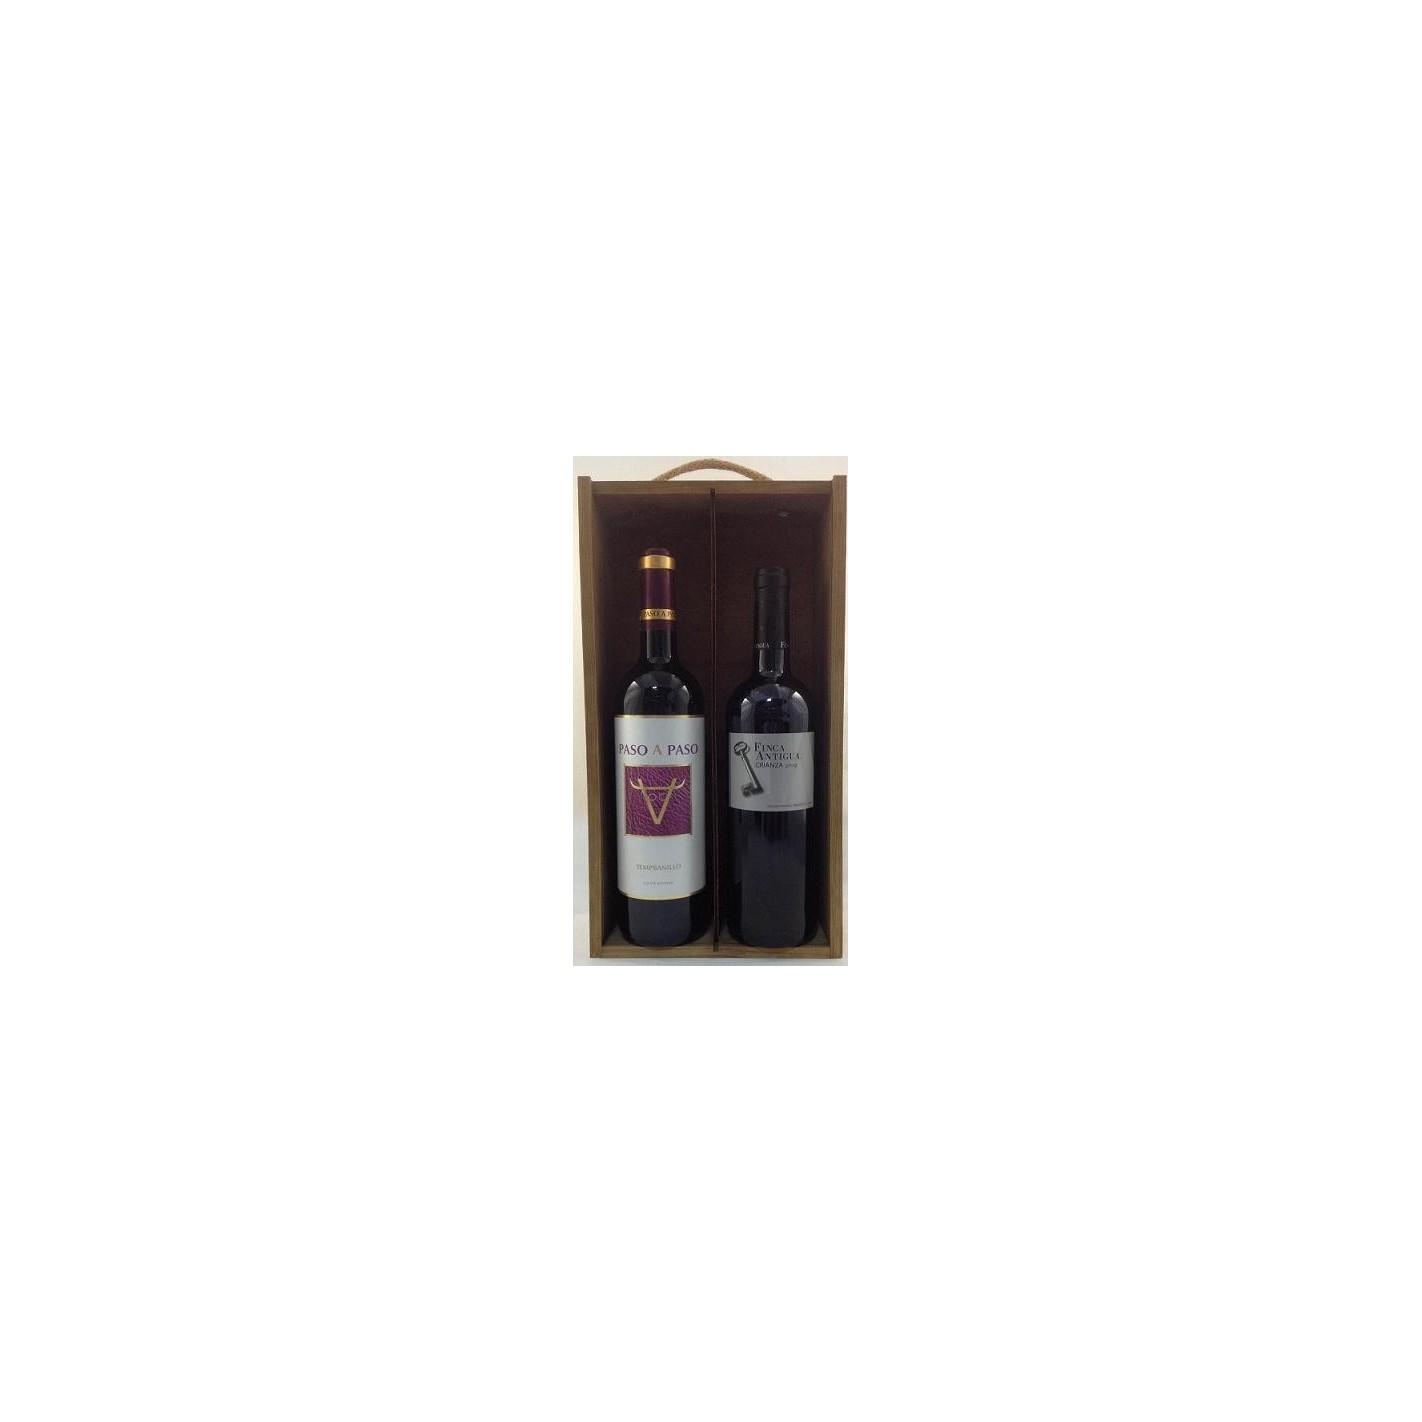 Estuche de vino 2 botellas mancha 3 surtido - Manchas de vino ...